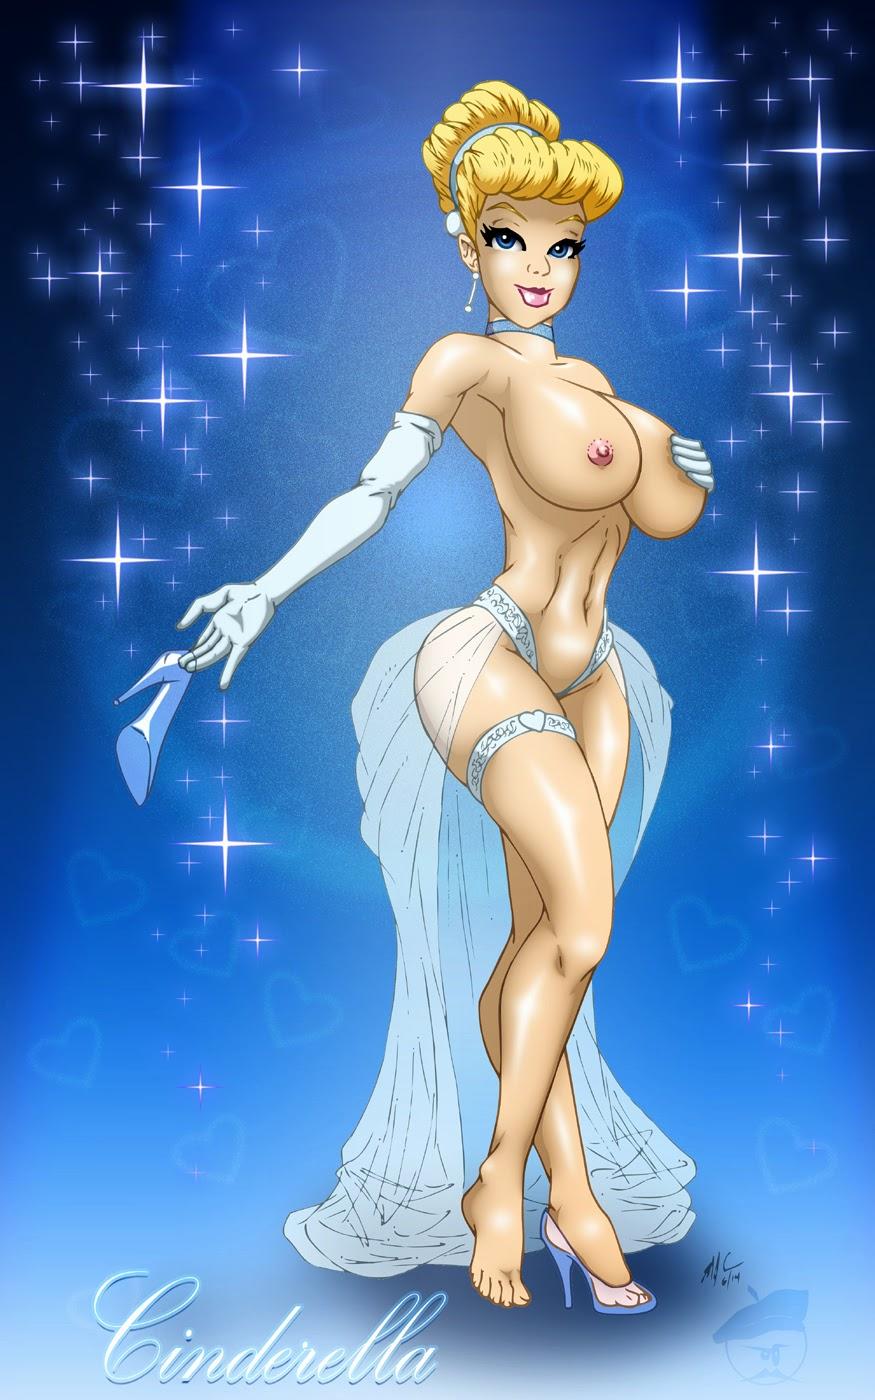 Erotic cinderella naked movie